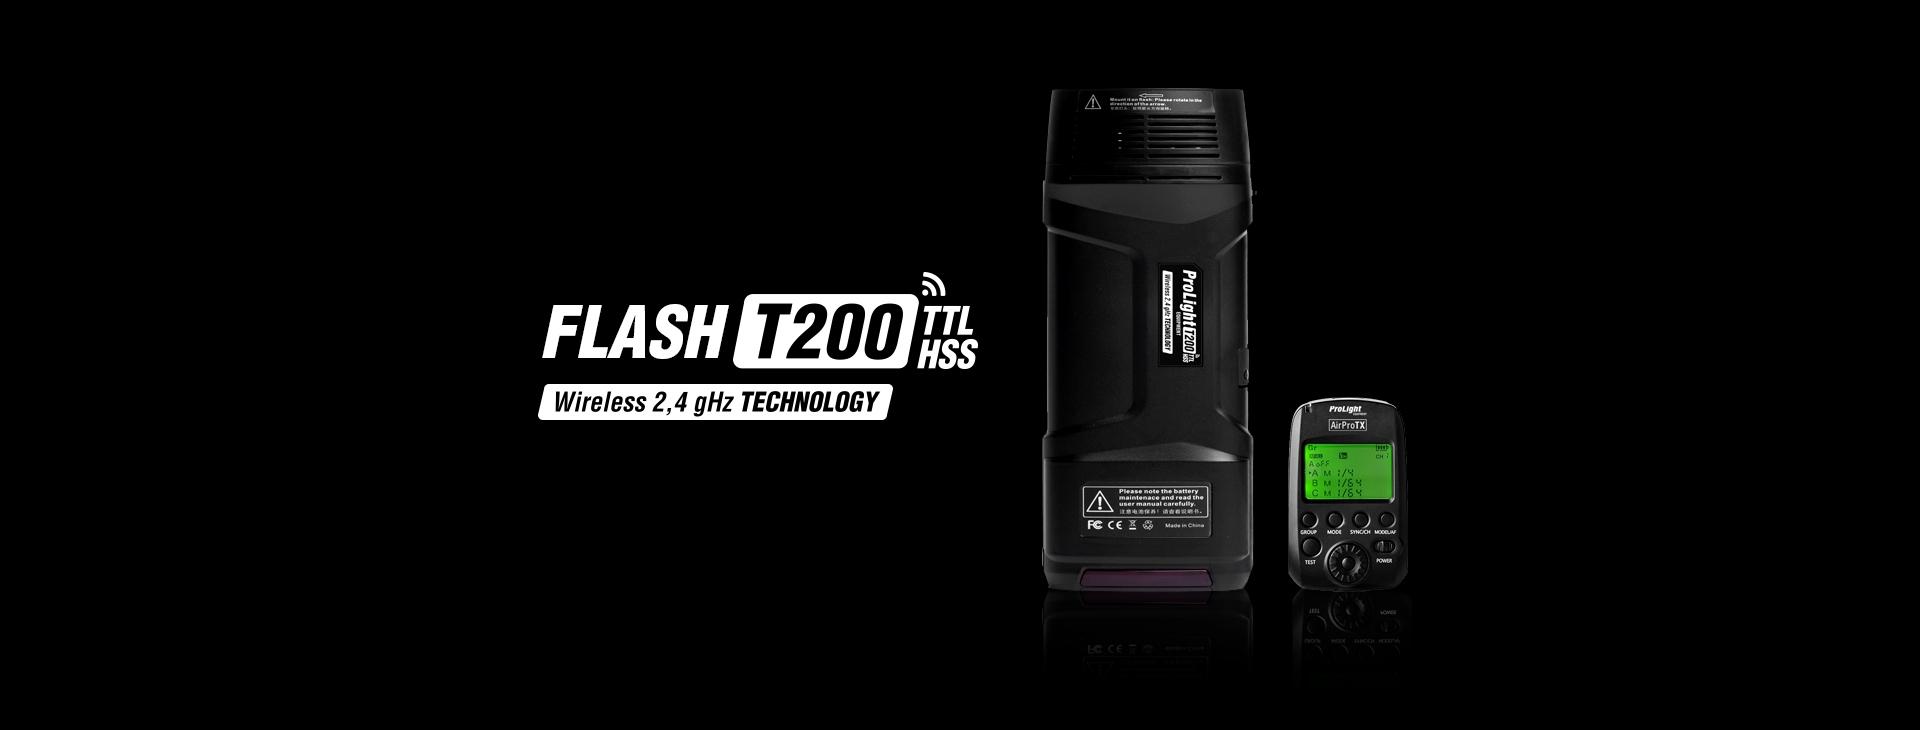 Flash T200